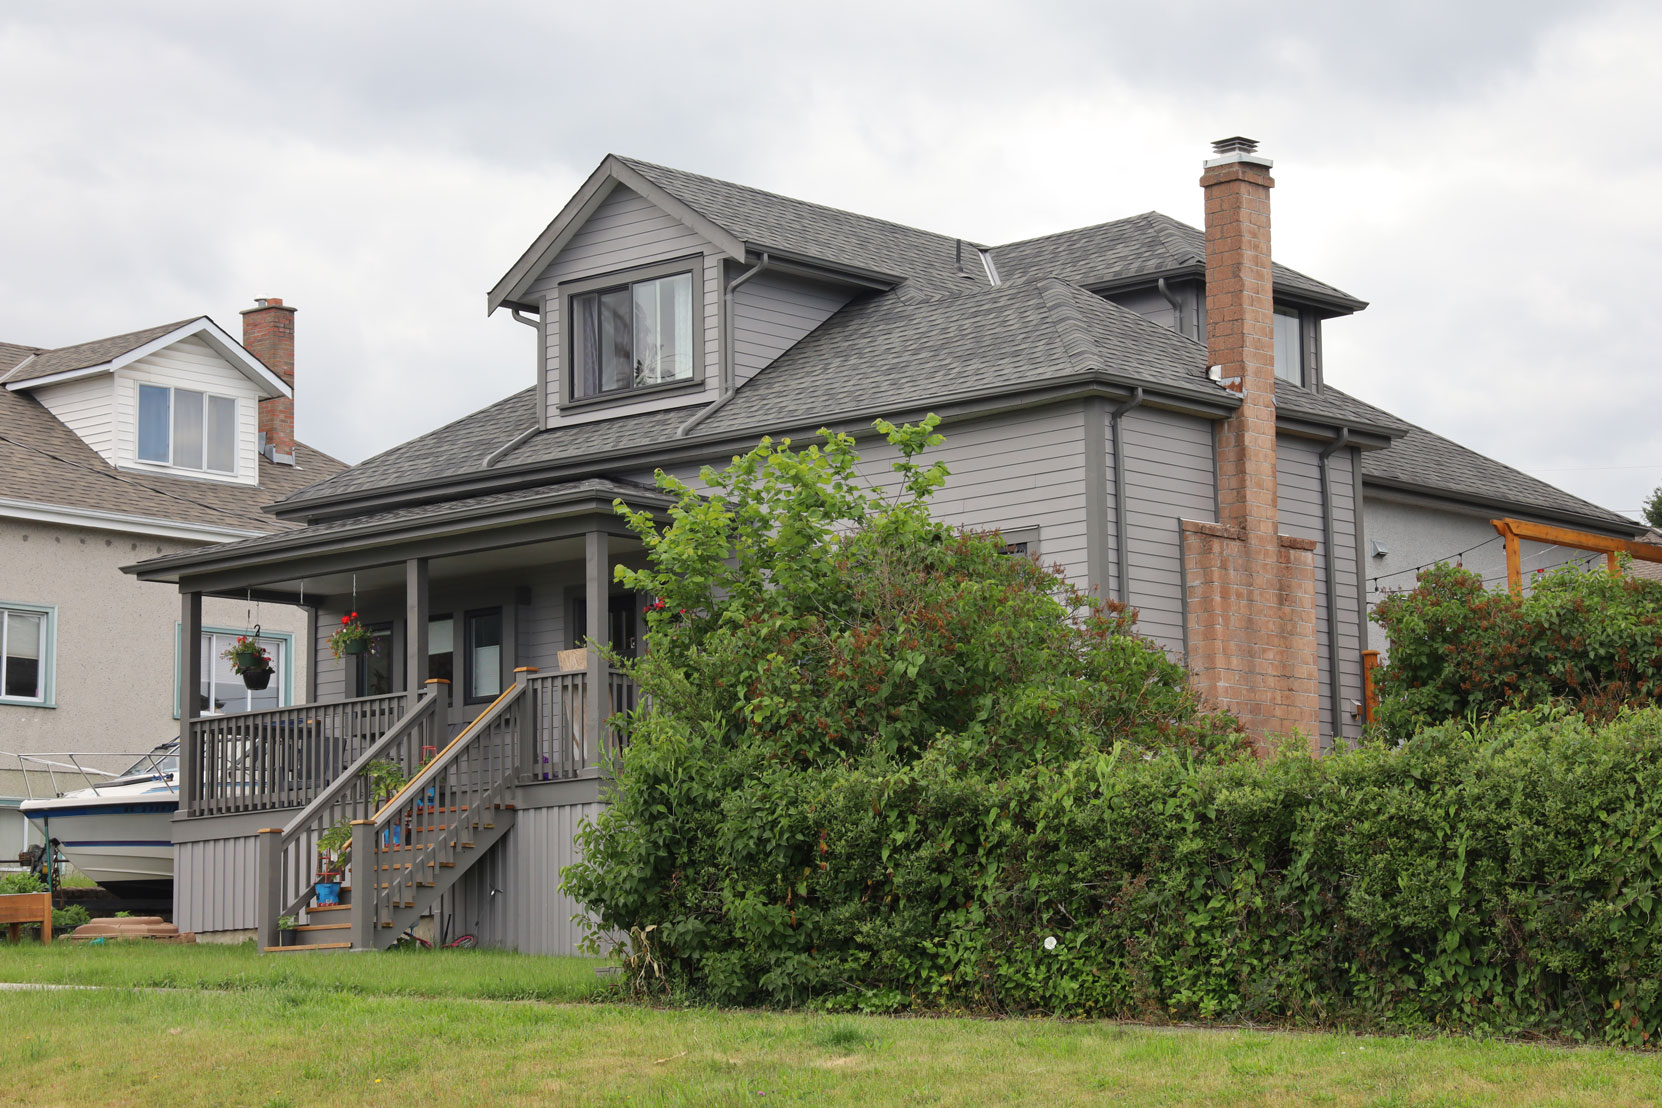 120 Methuen Street, Ladysmith, BC, built in 1941